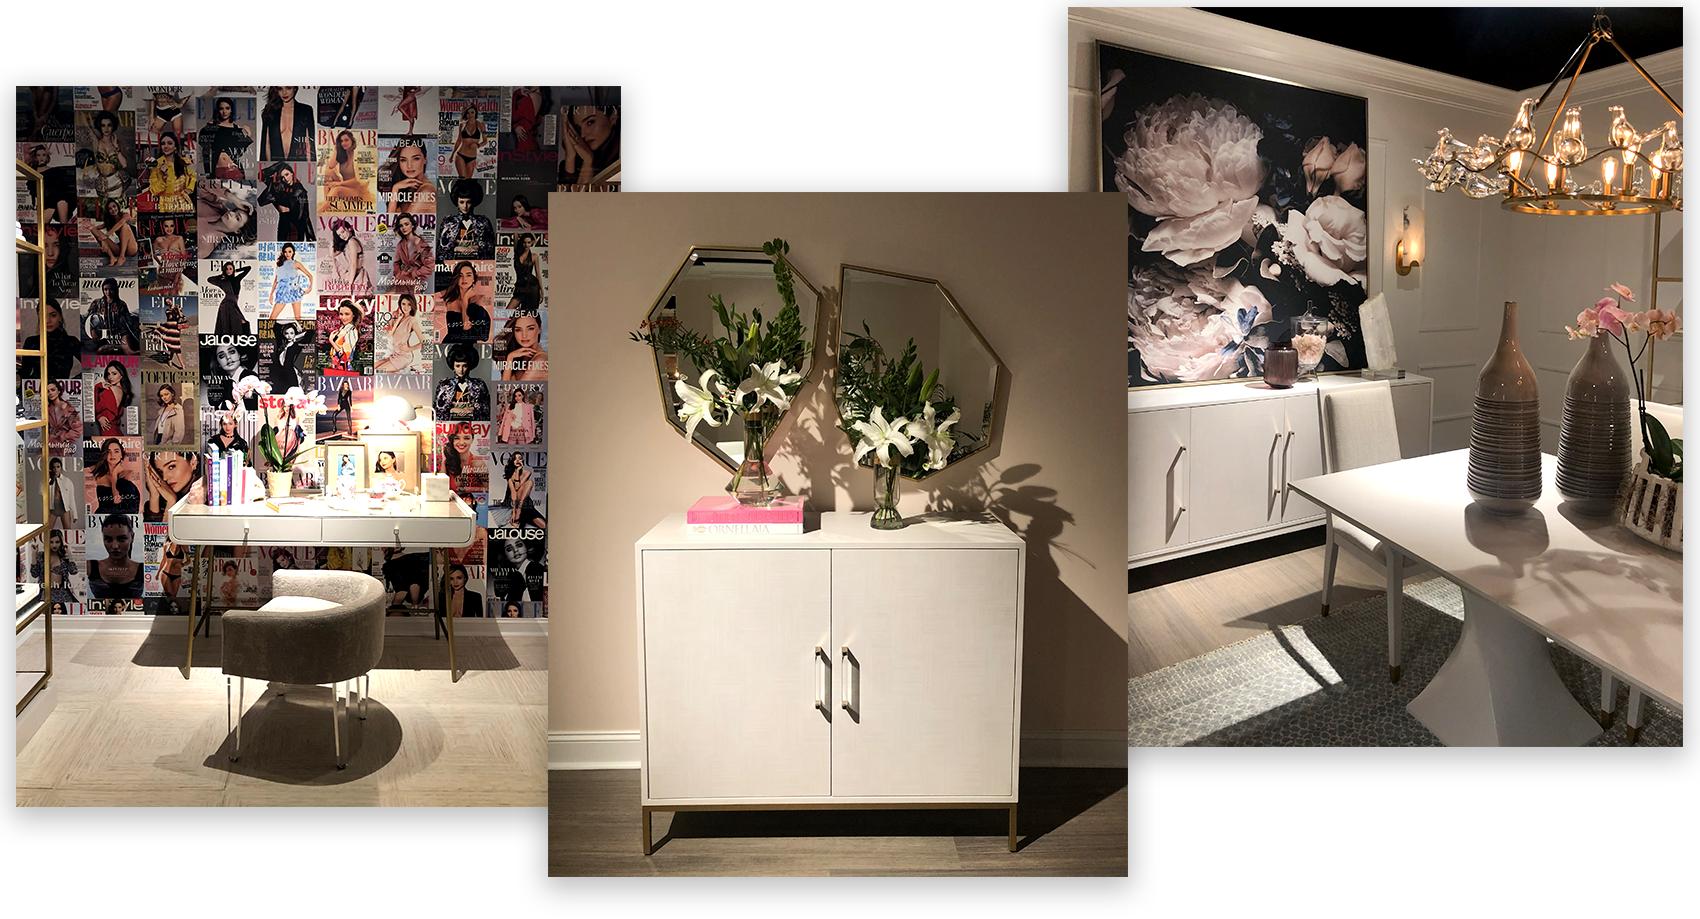 universal-miranda-kerr-home-collage